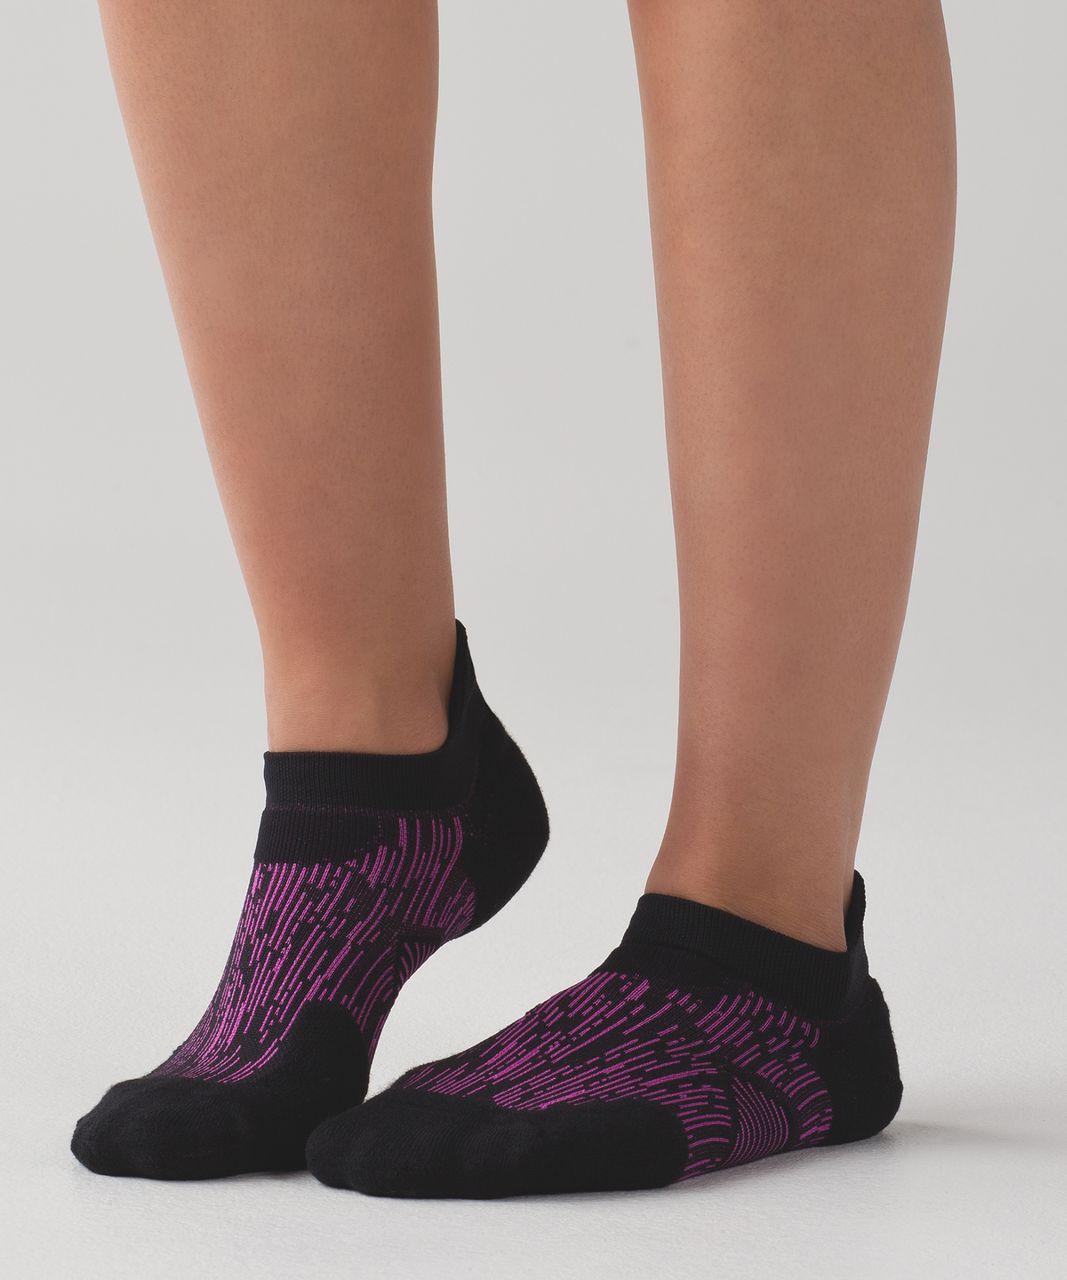 Lululemon High Speed Sock (Silver) - Black / Polar Pink / Pow Pink